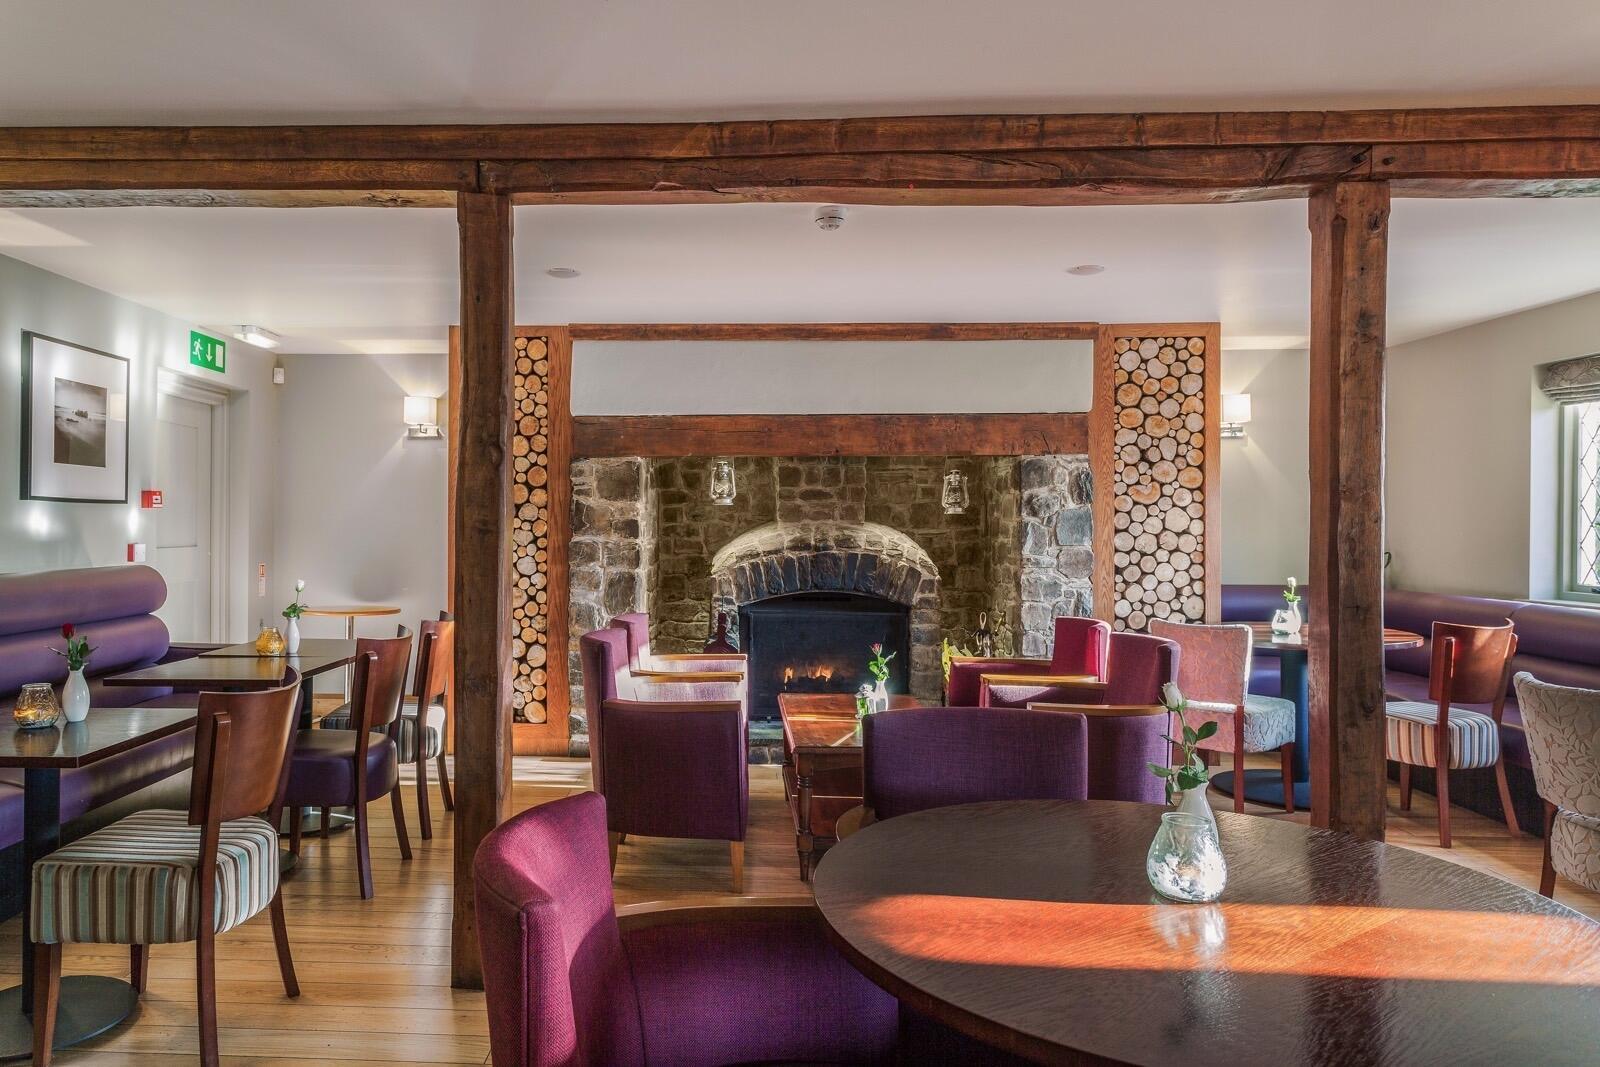 Restaurant at Woodford Bridge Country Club, Devon